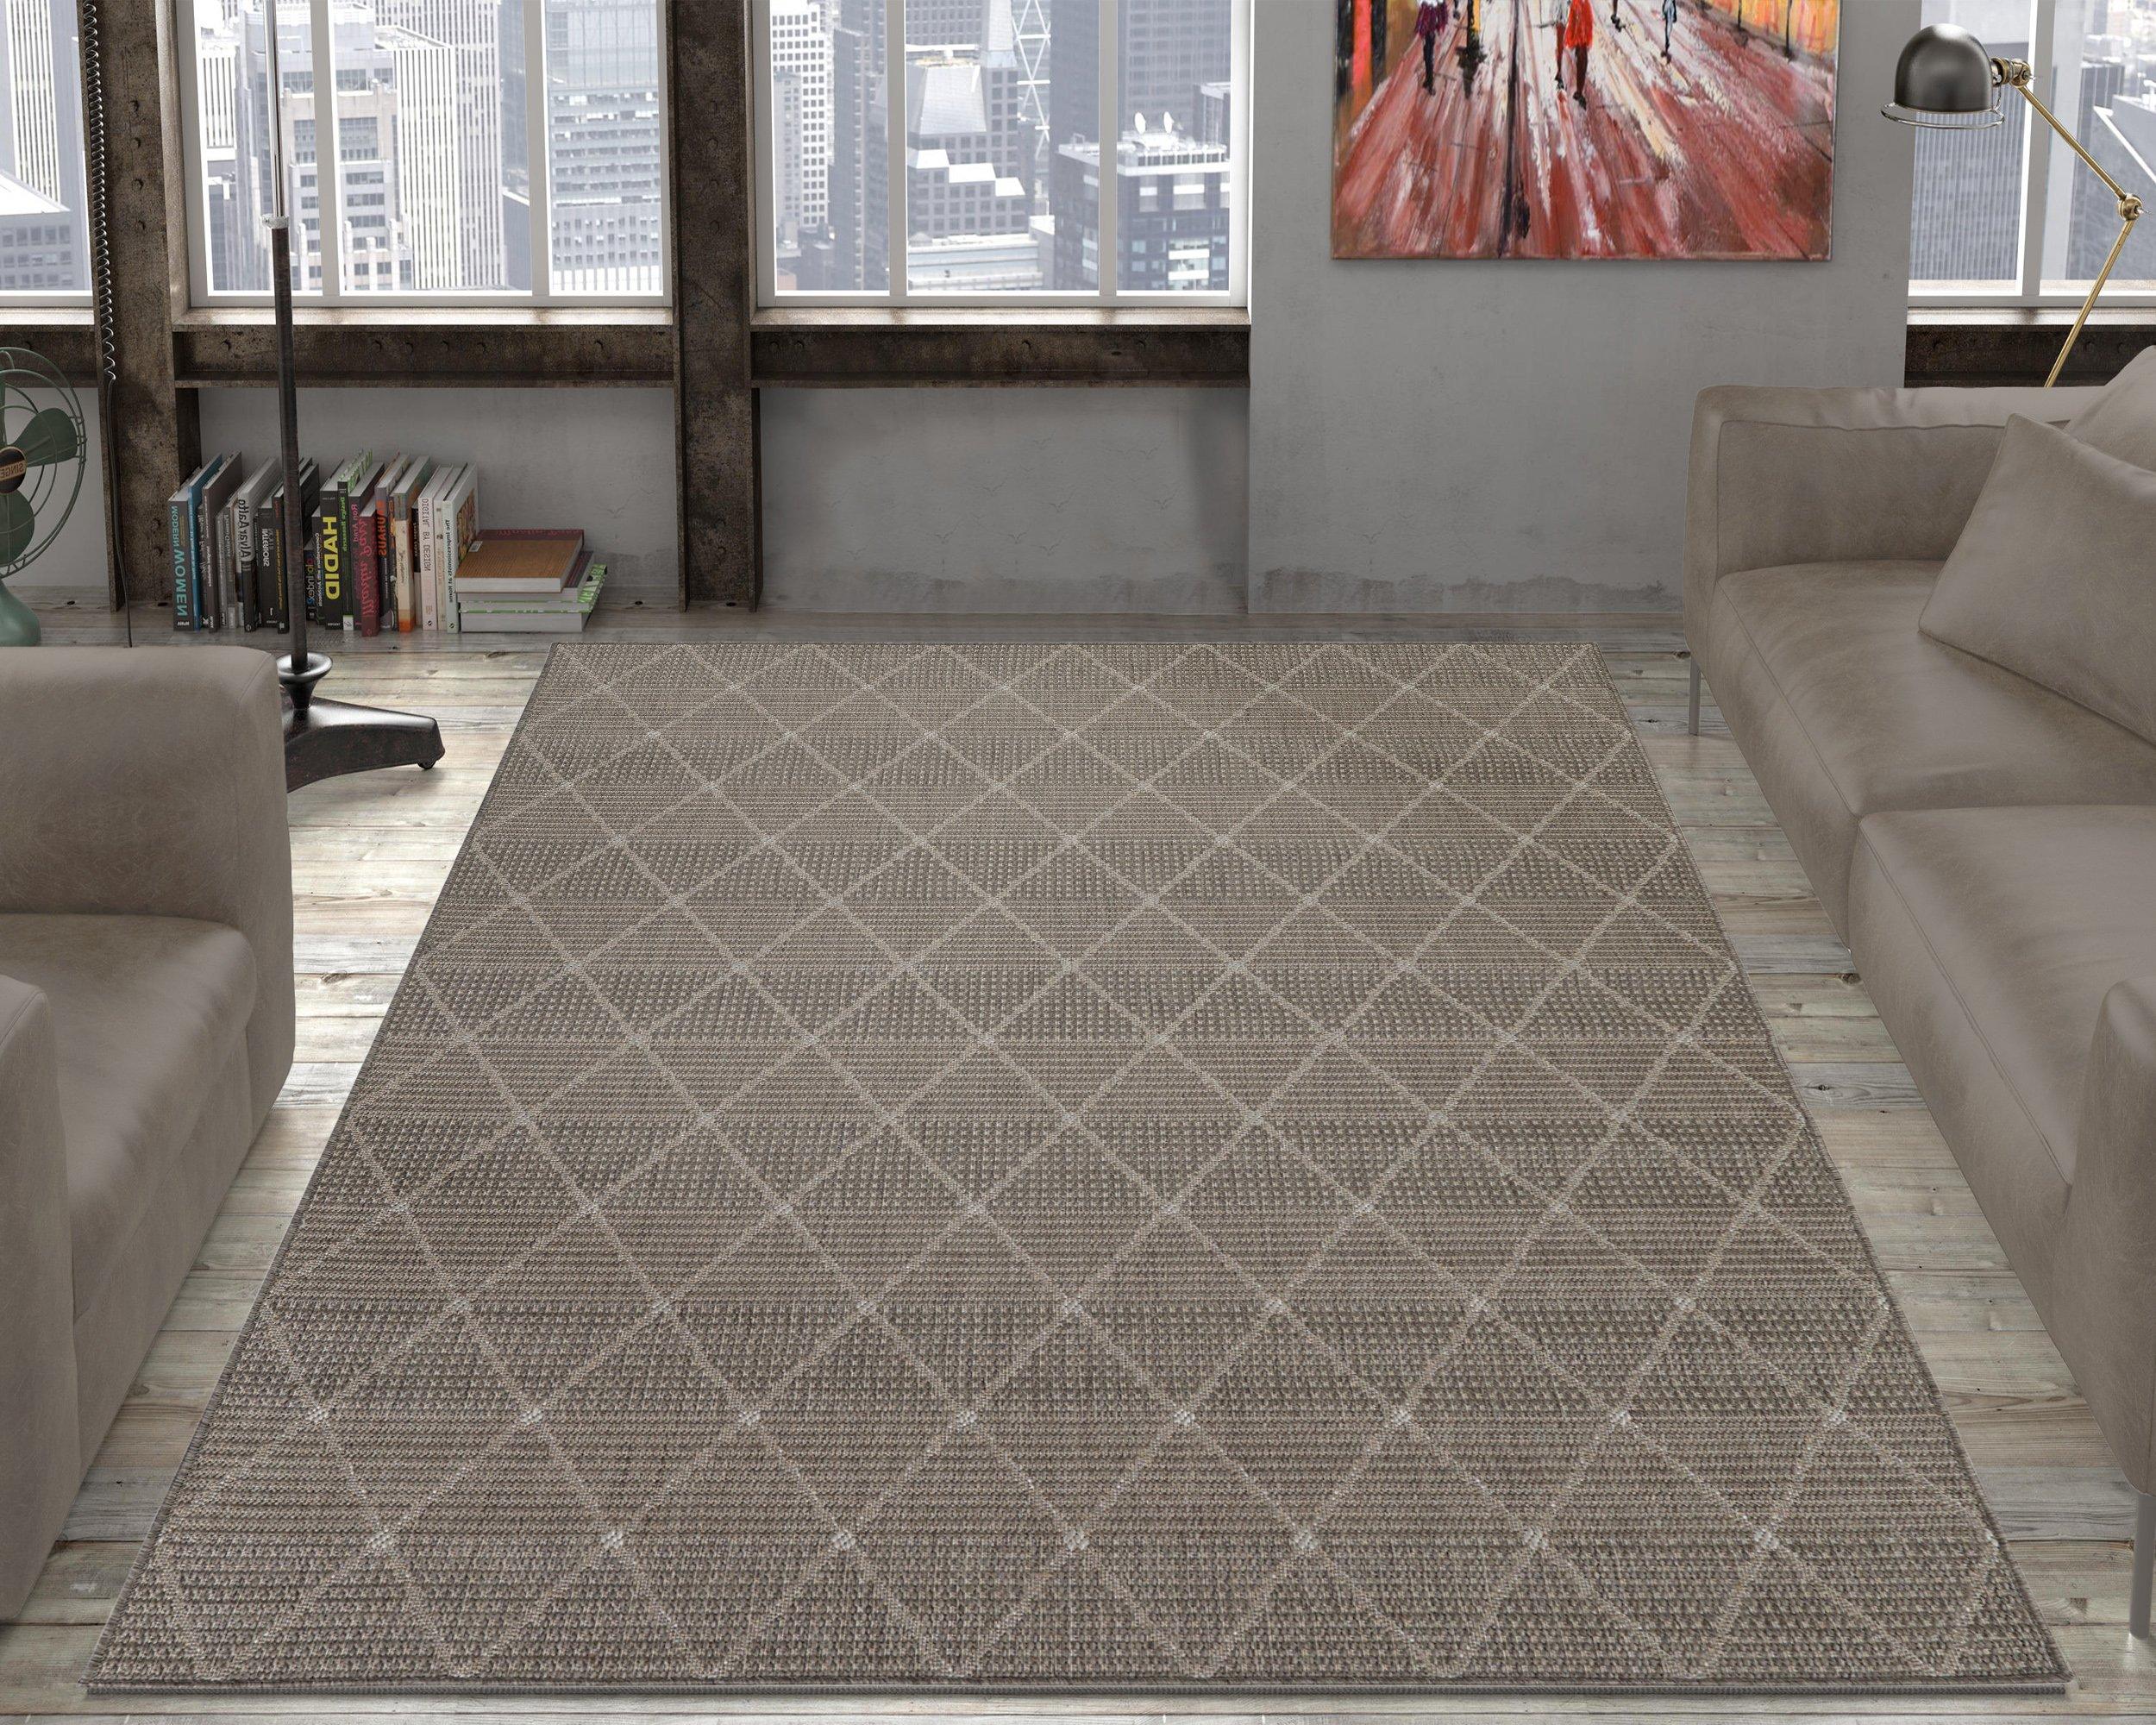 Ottomanson Jardin Collection Contemporary Trellis Design Indoor/Outdoor Jute Backing Area Synthetic Sisal Rug, Grey, 5'3'' x 7'3''